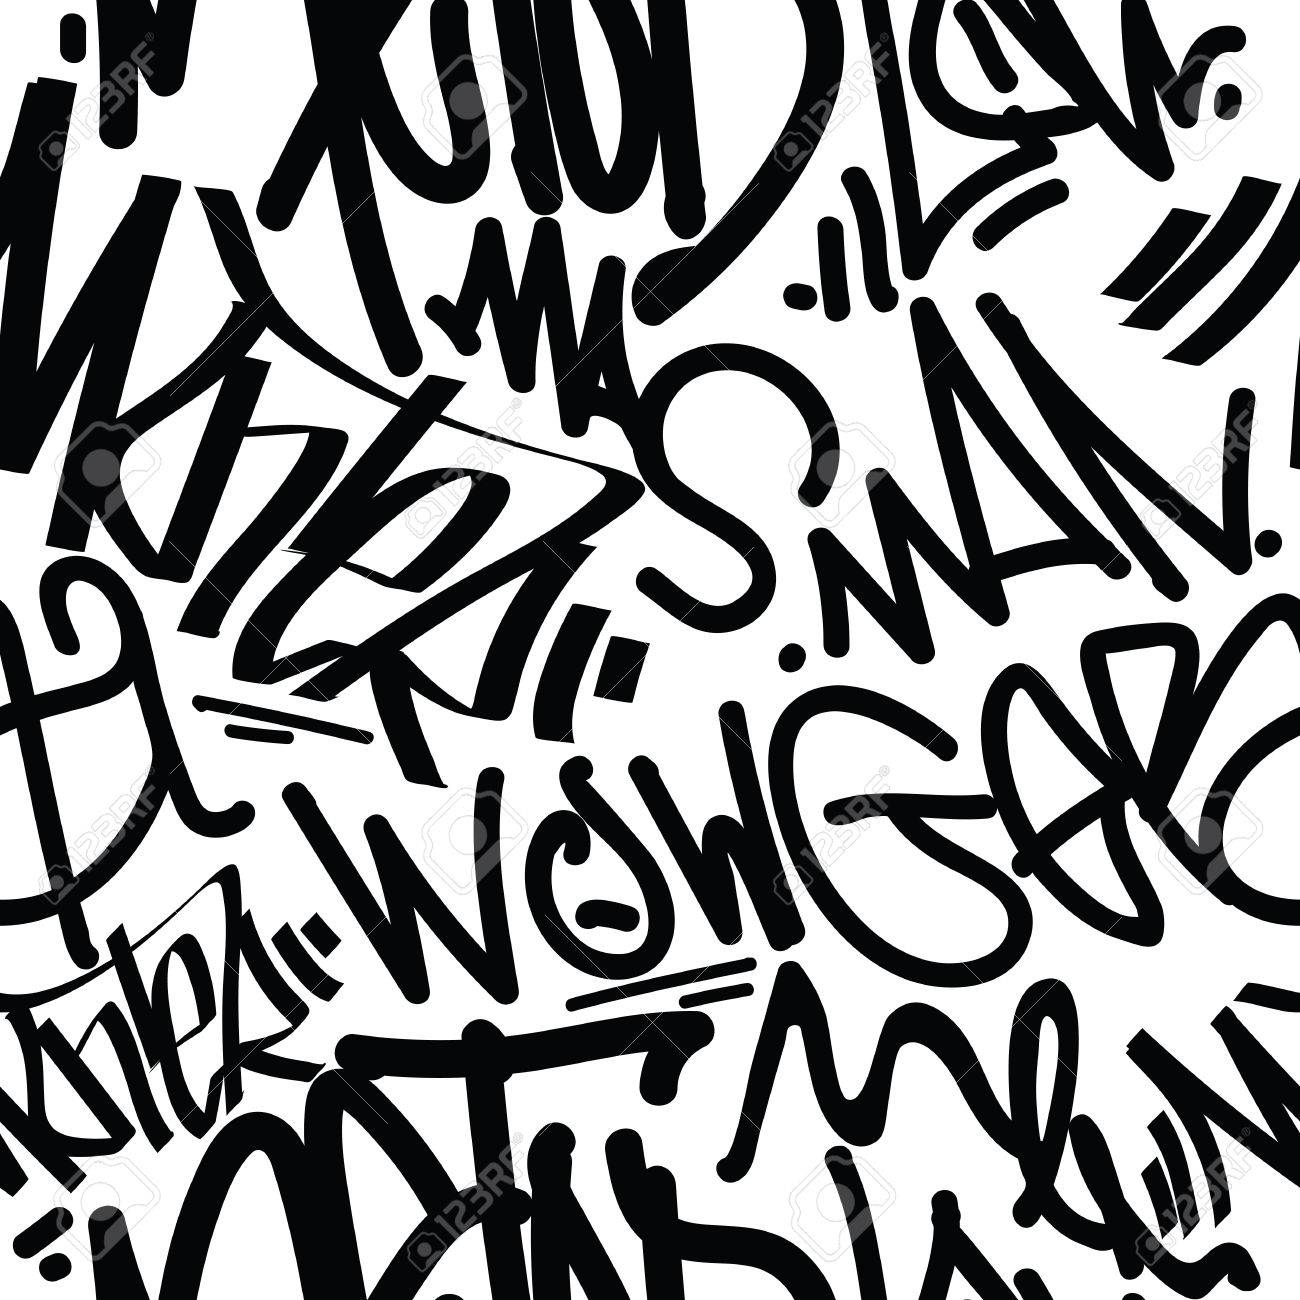 Tags Seamless Pattern Fashion Graffiti Drawing Texture Street Art Retro Style Abstract